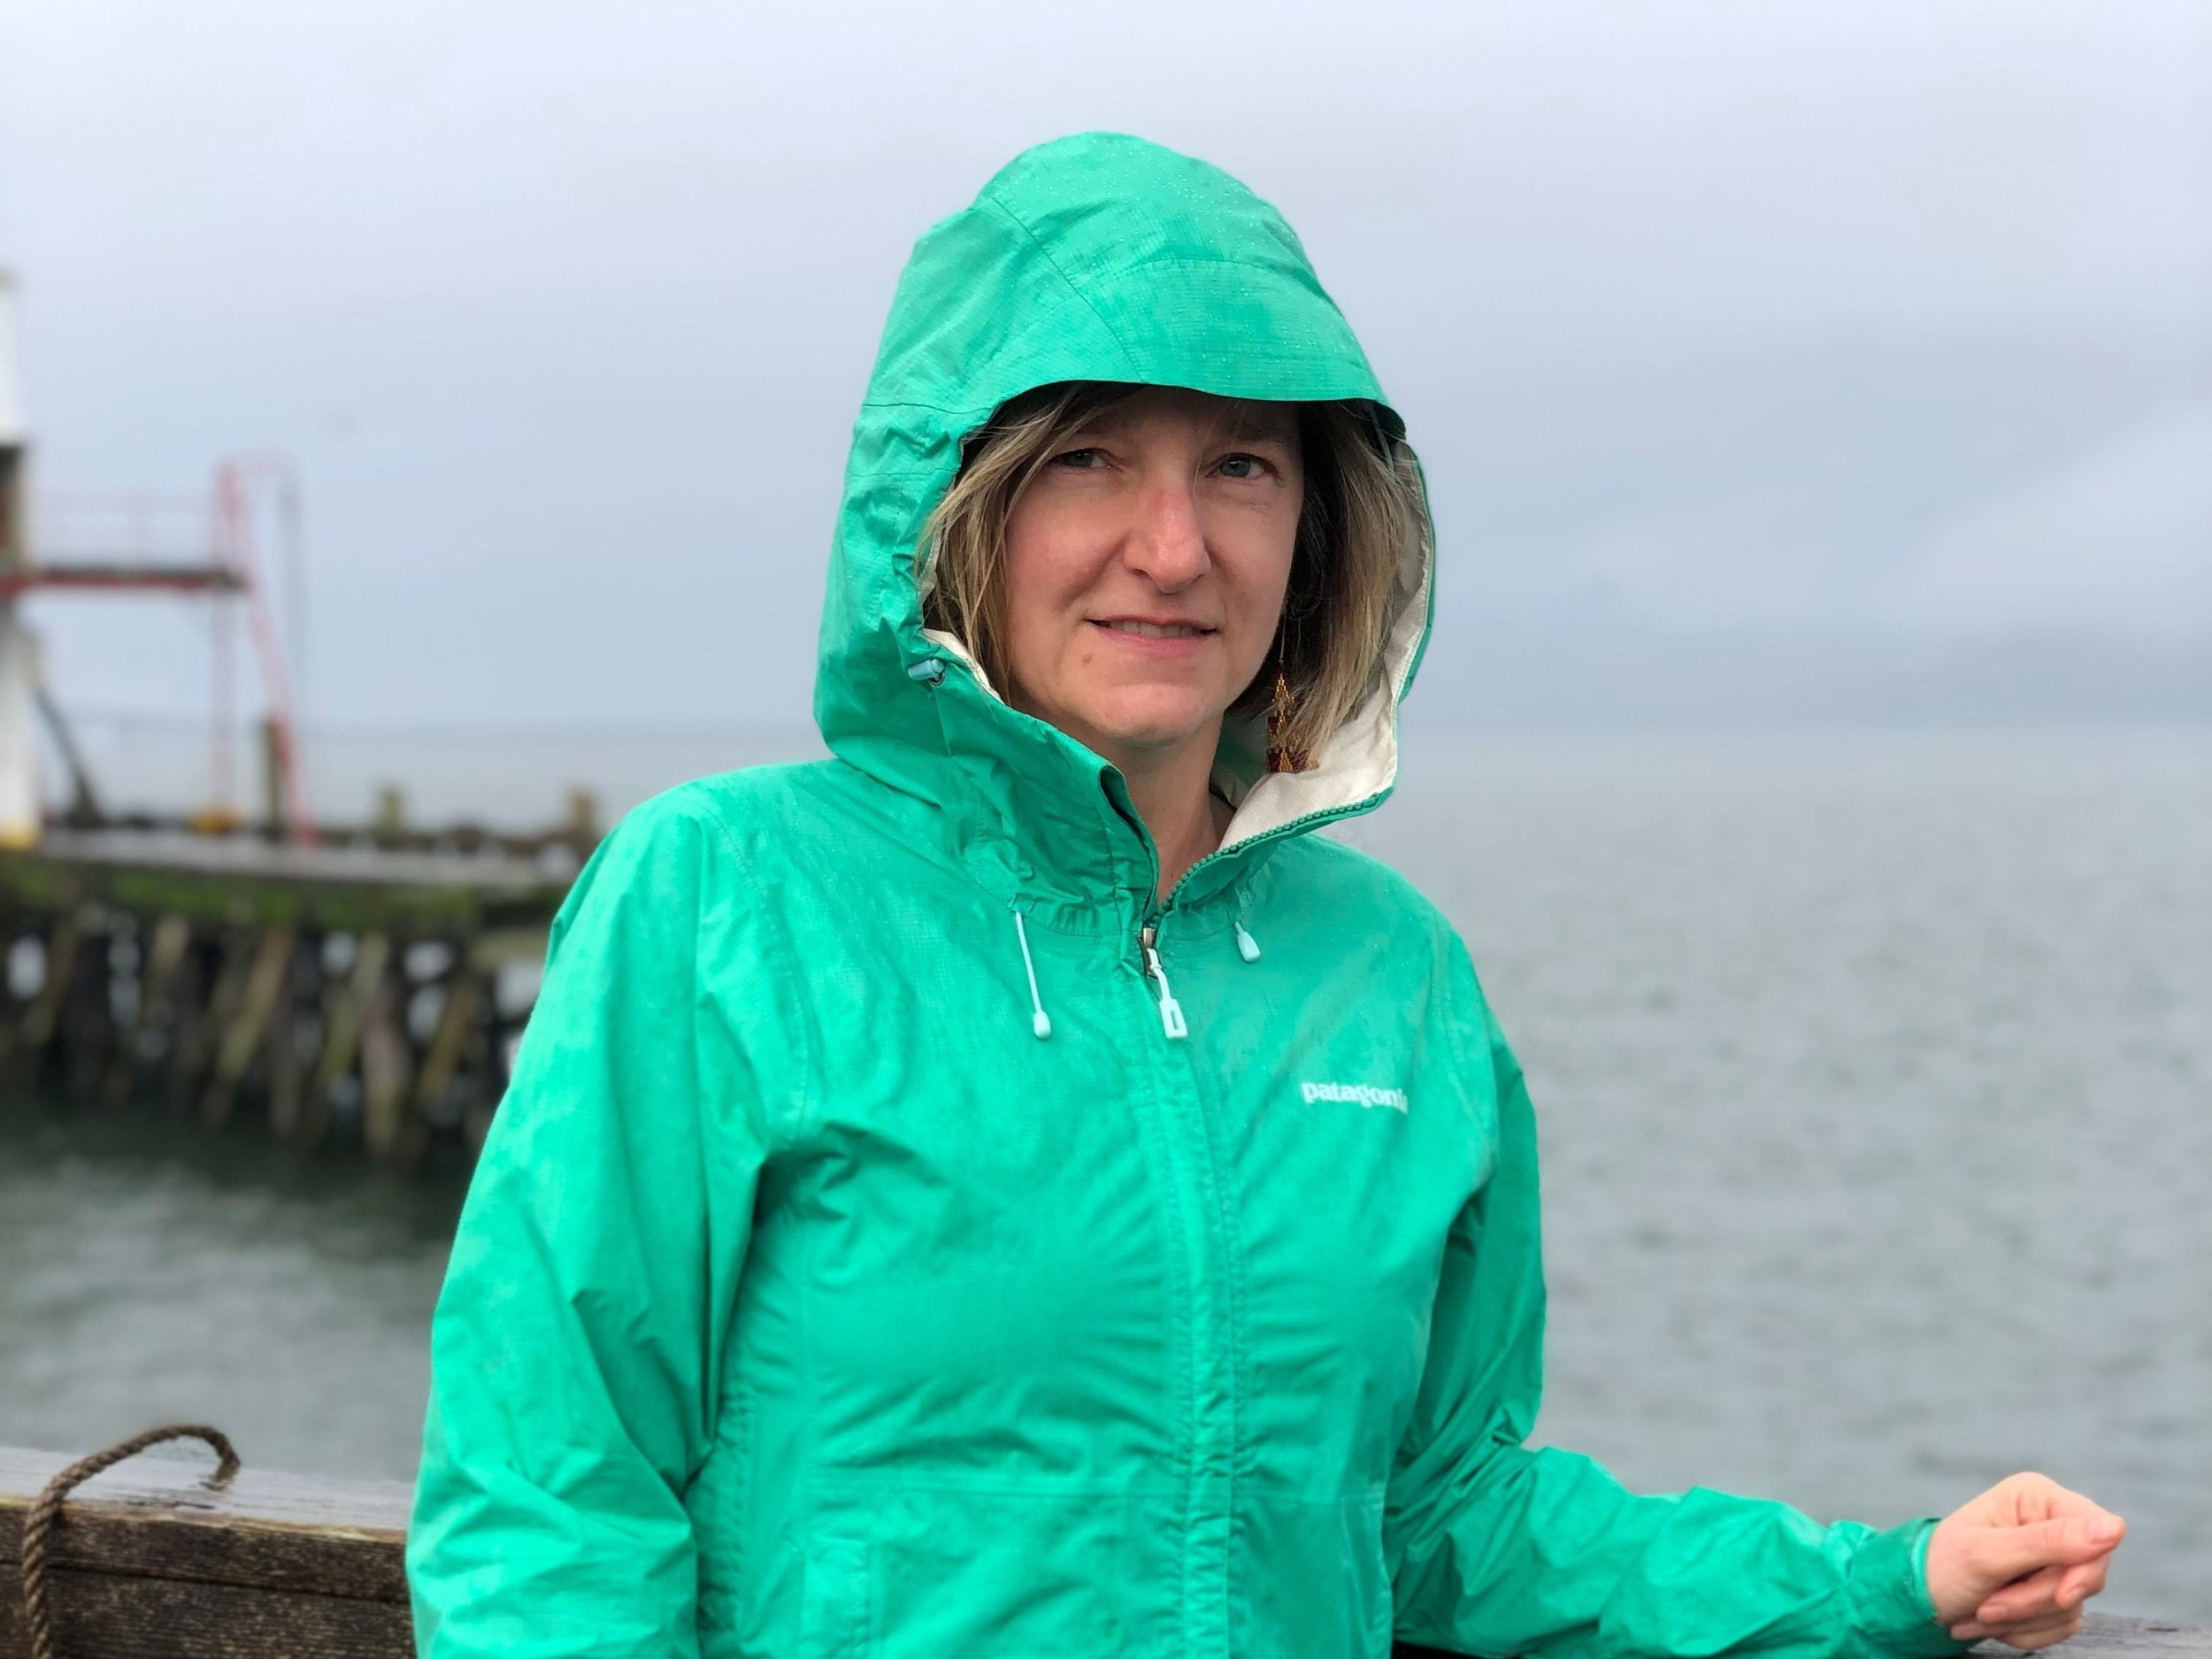 The Eco-Friendly Rain Jacket - Patagonia TorrentshellRead why→